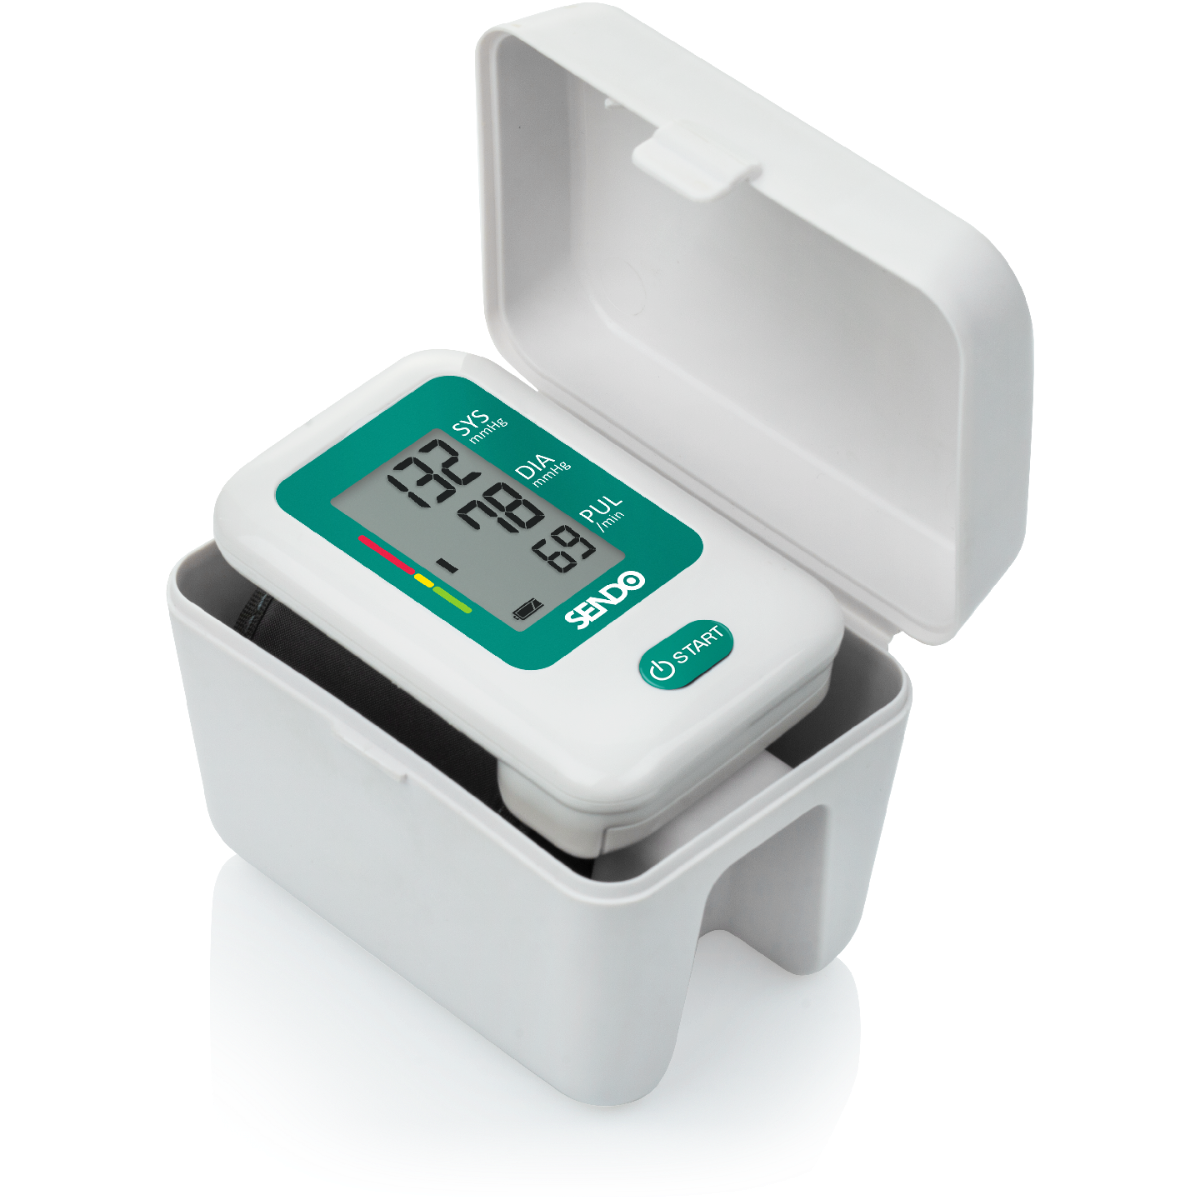 Tensiometru de incheietura portabil Smart 2, 1 bucata, Sendo imagine produs 2021